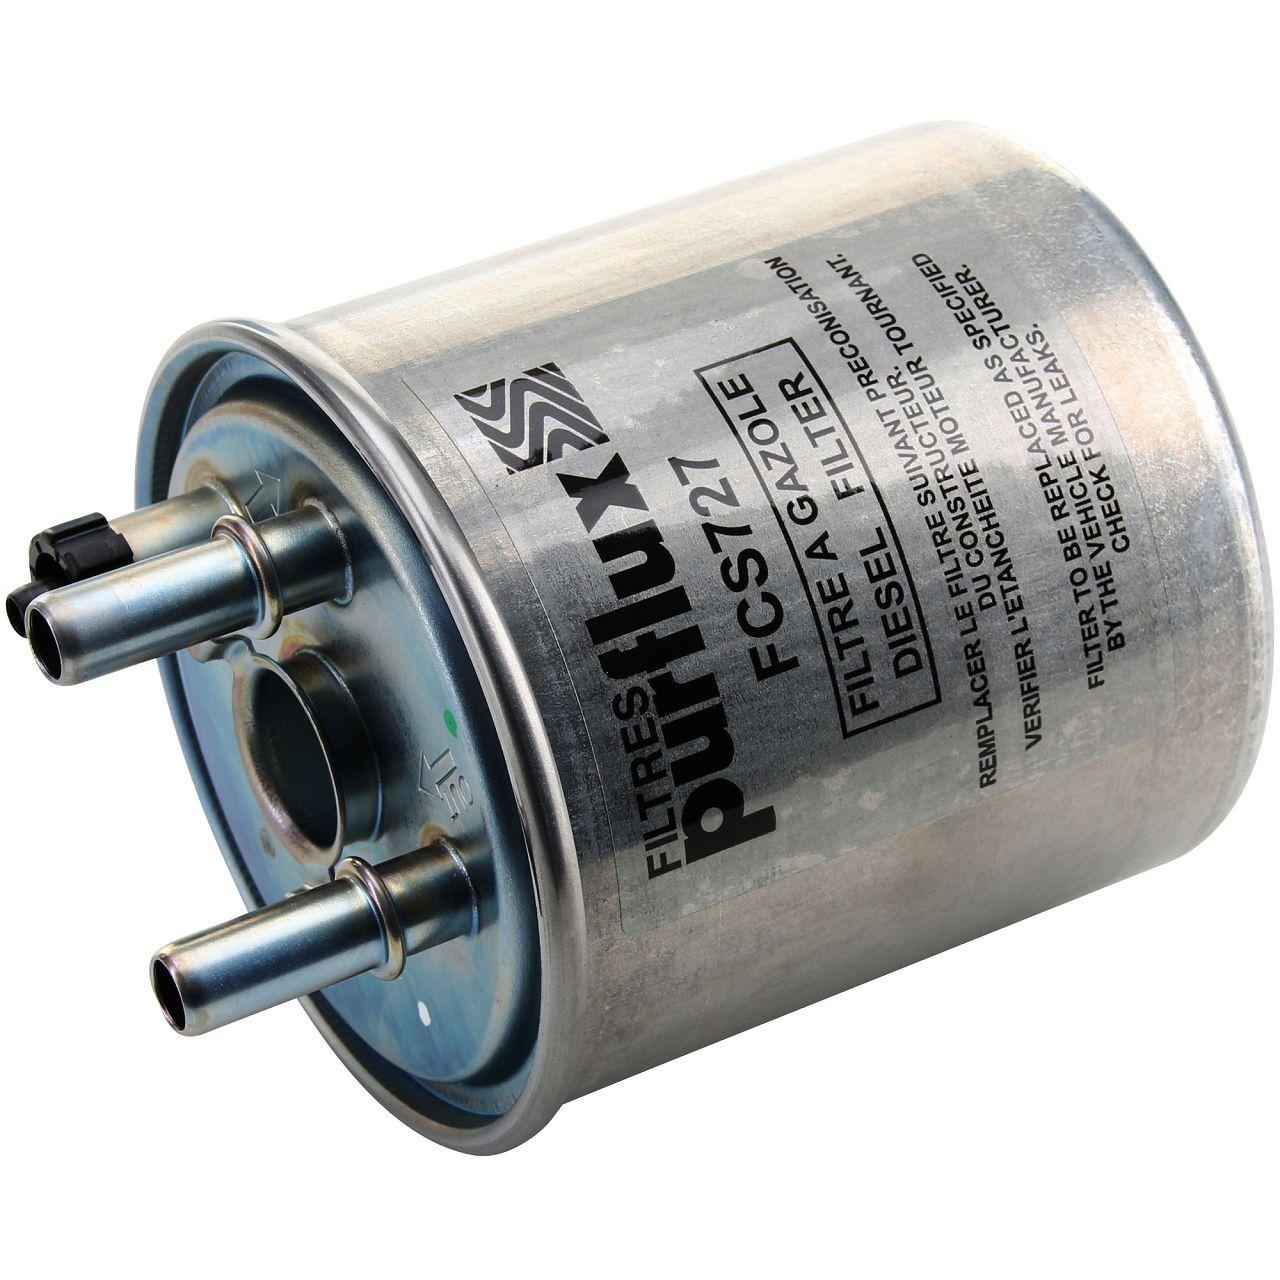 Filterpaket Filterset für Renault Kangoo 1.5dCi 68-110 PS bis 04.2009